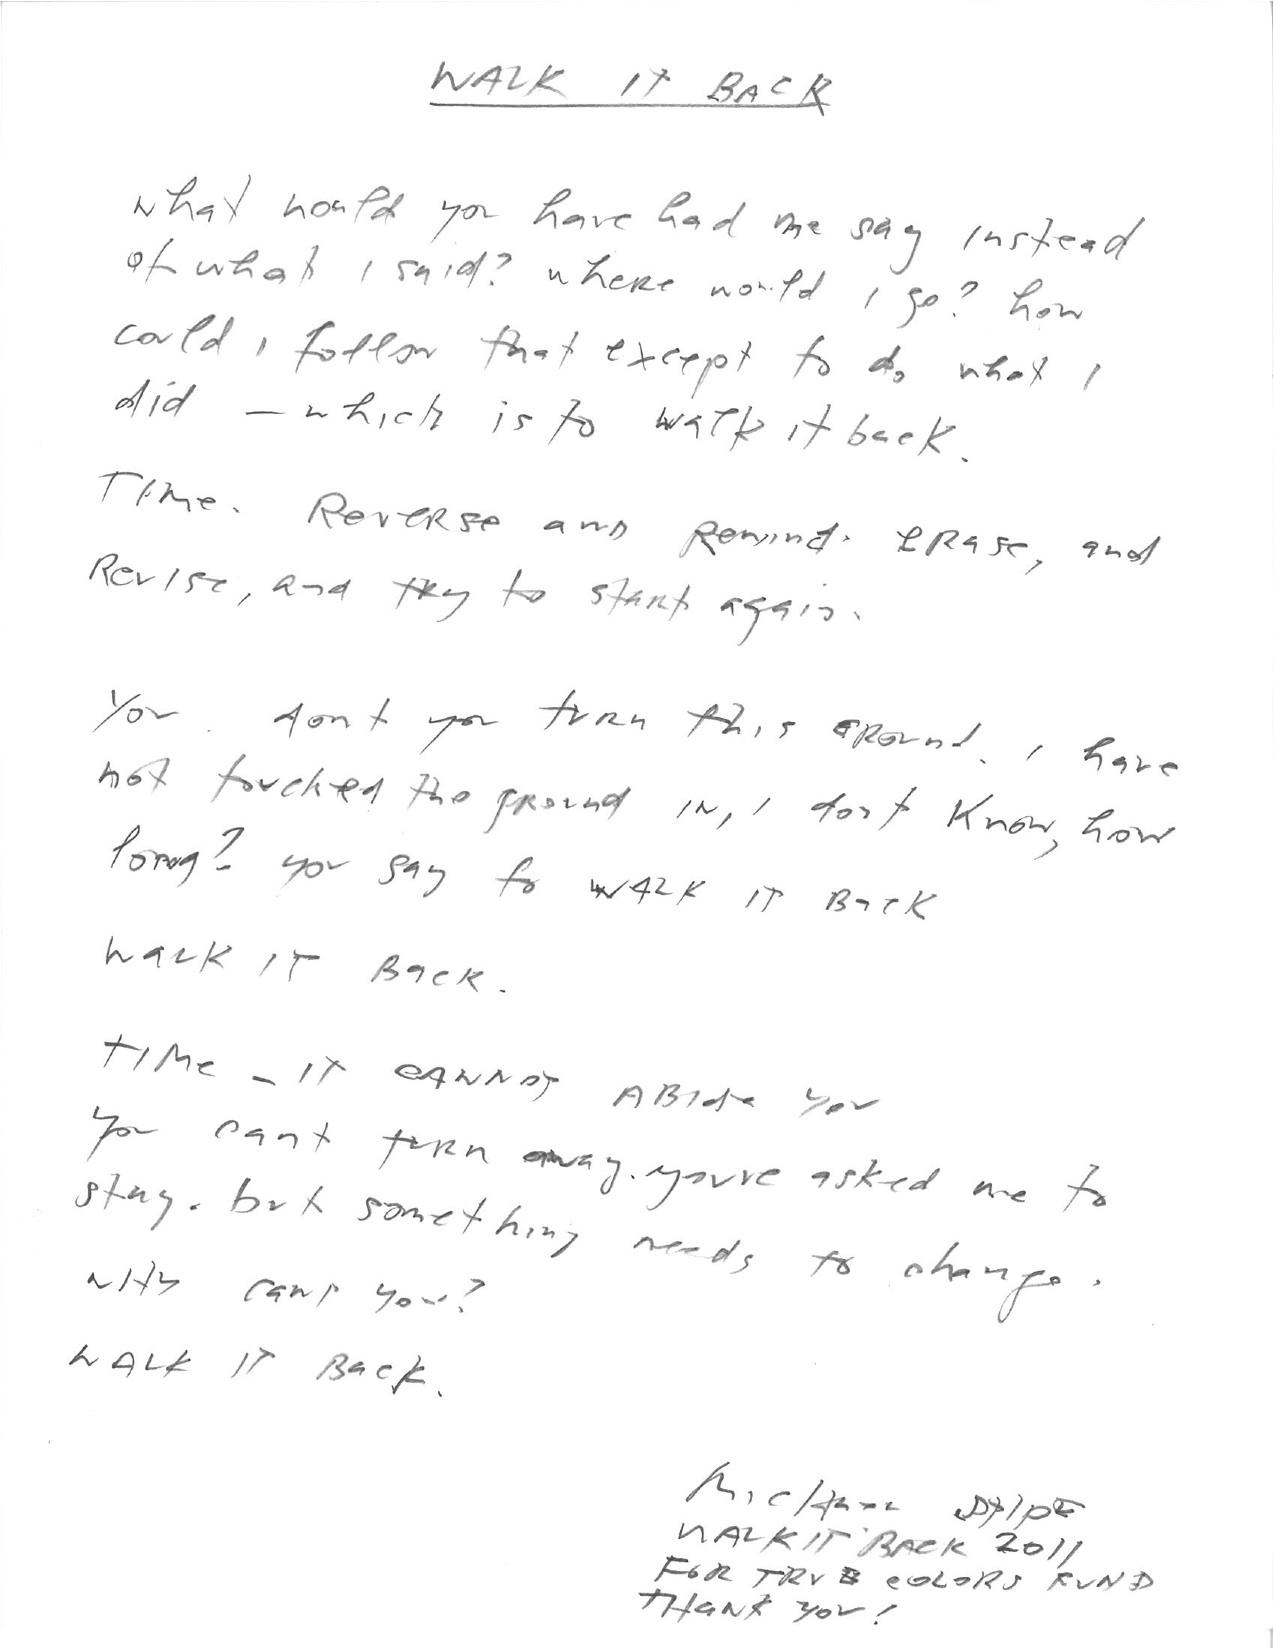 Charitybuzz Michael Stipe Handwritten Walk It Back Lyrics Lot 253935